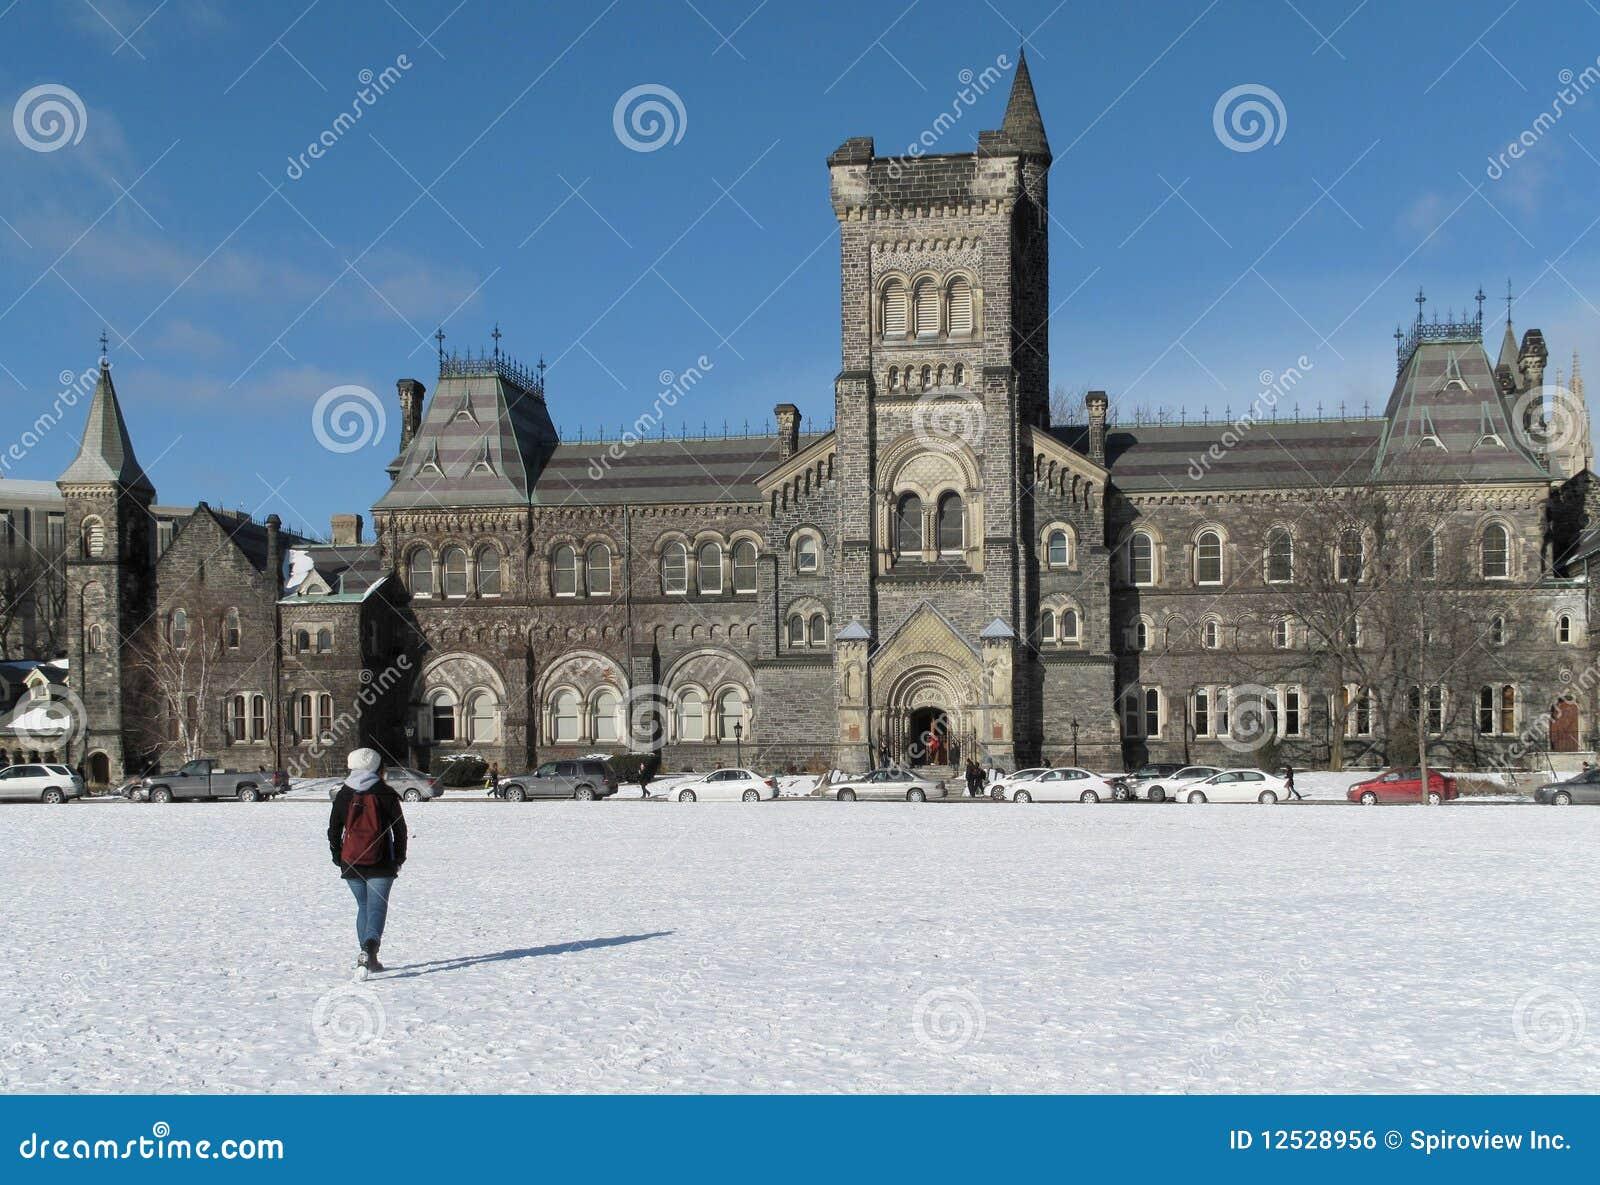 University in winter